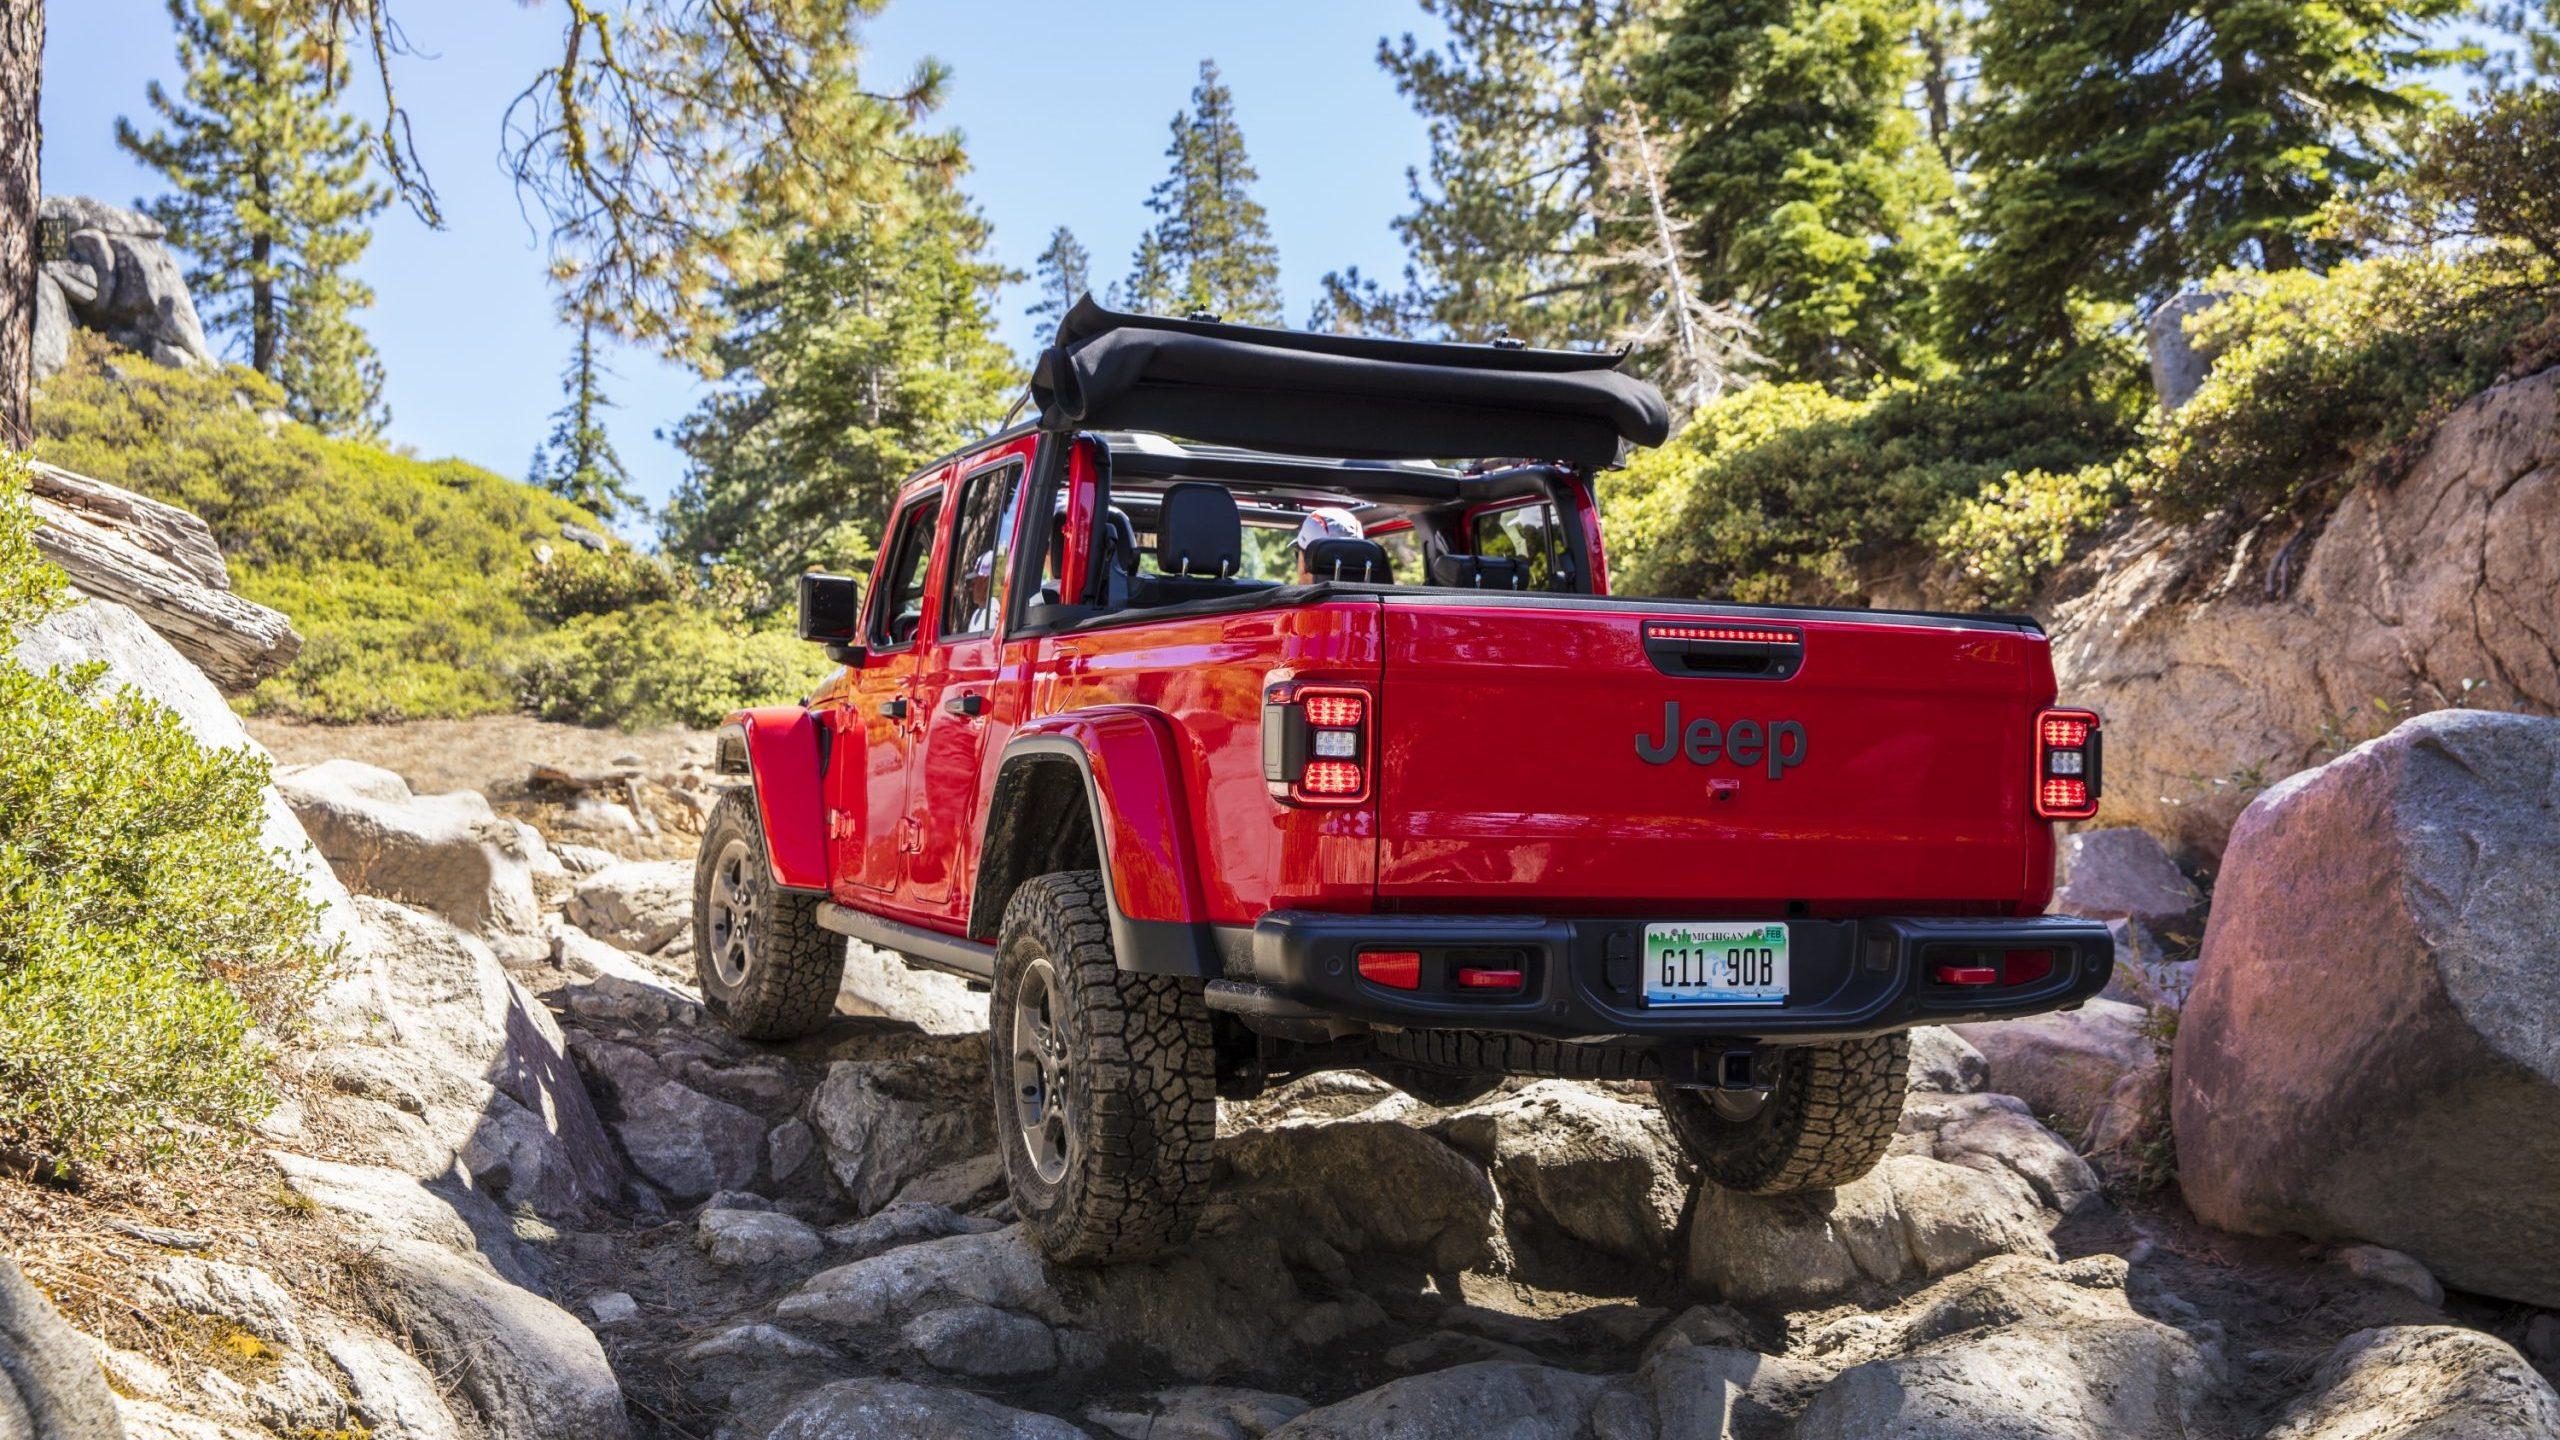 2021 Jeep® Gladiator Rubicon on the Rubicon Trail